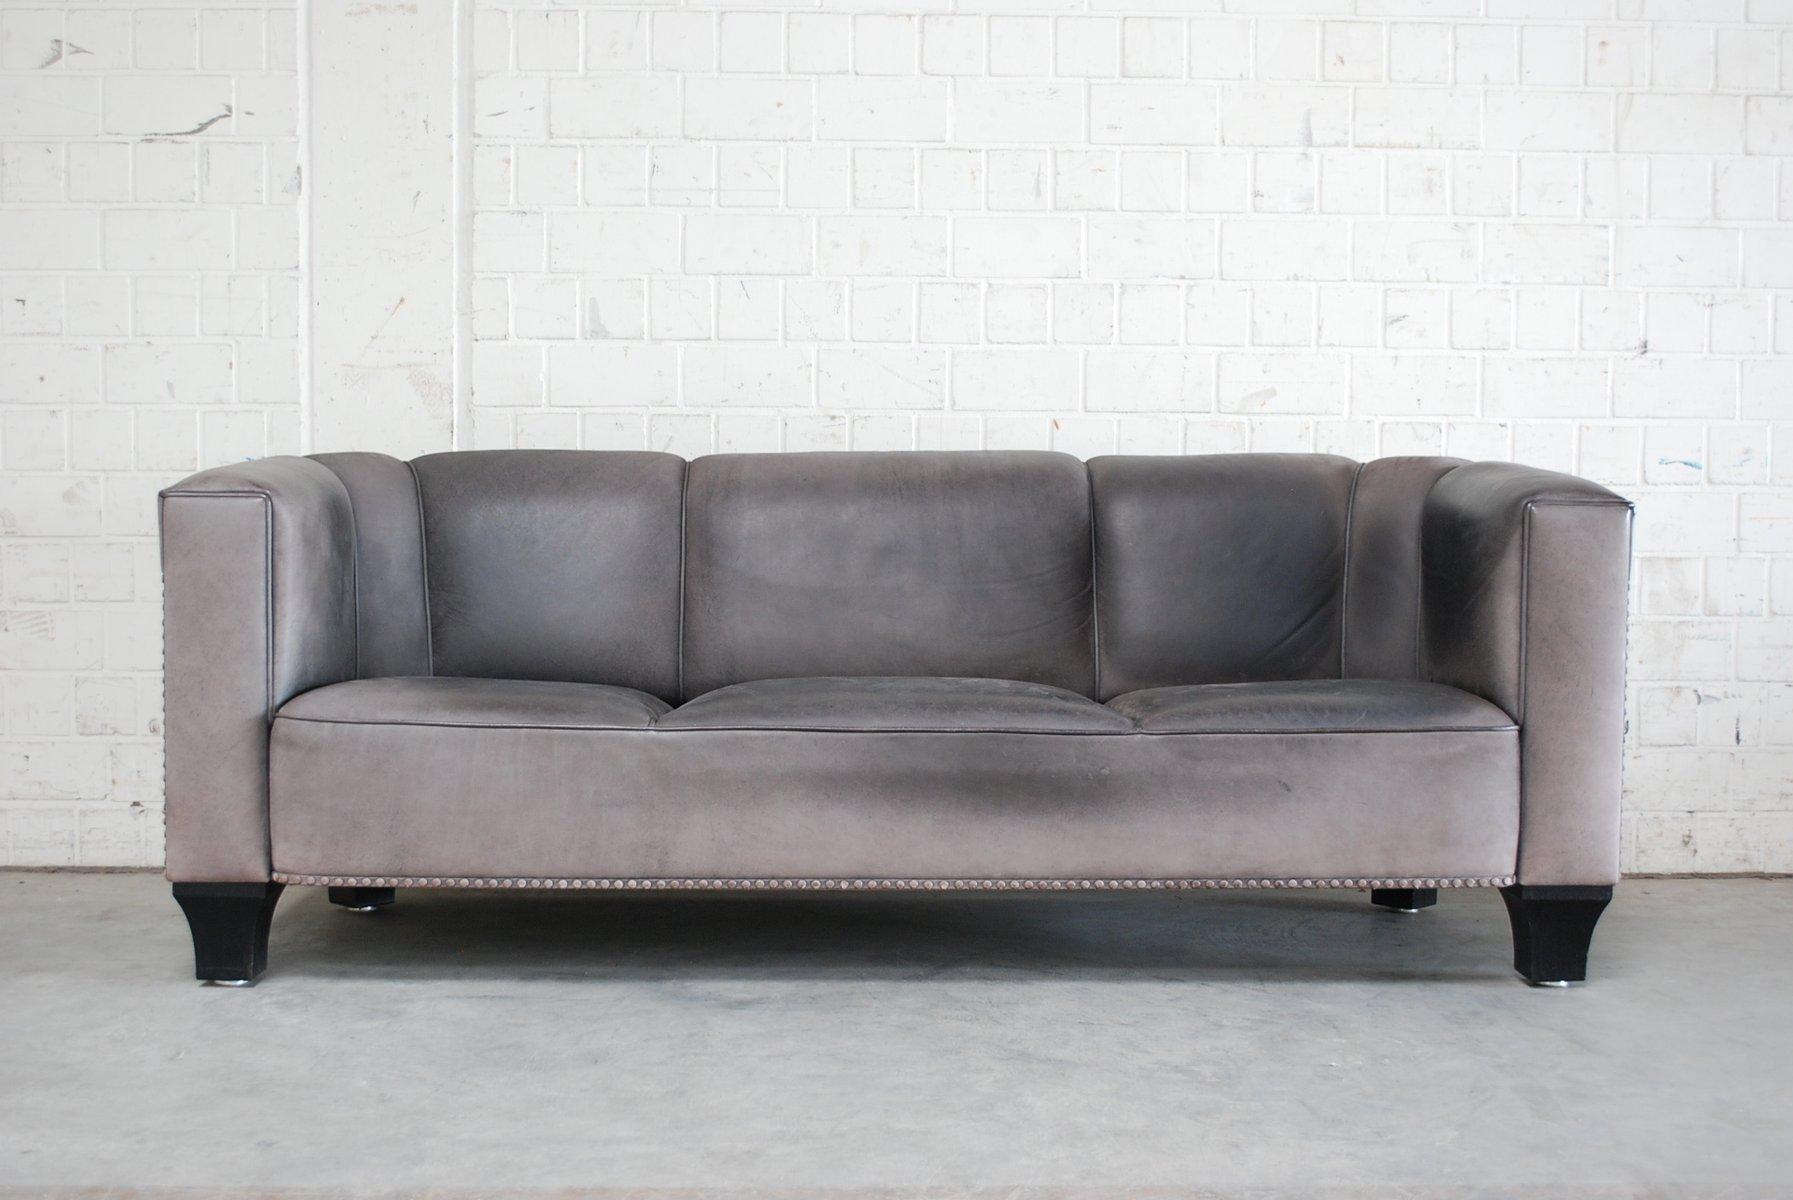 vintage palais stoclet sofa aus leder von josef hoffmann f r wittmann 1980er bei pamono kaufen. Black Bedroom Furniture Sets. Home Design Ideas